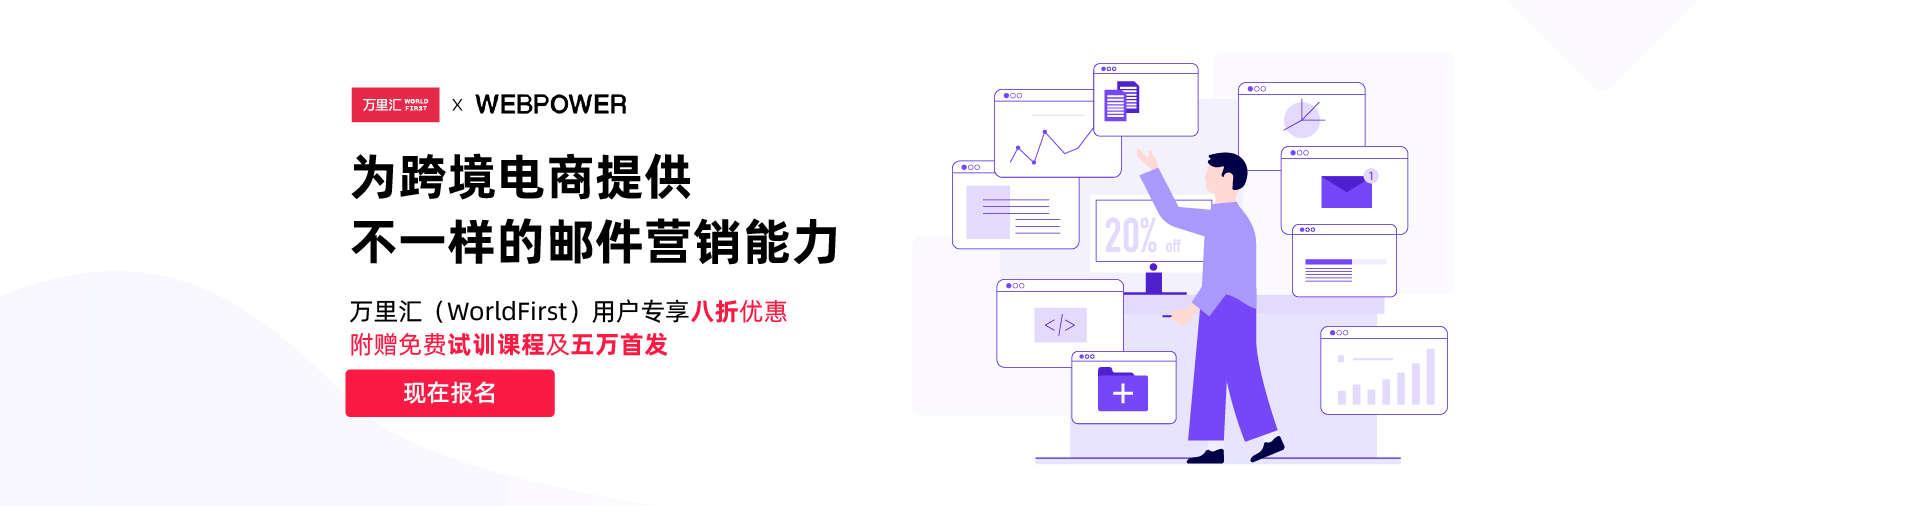 WebPower邮件营销